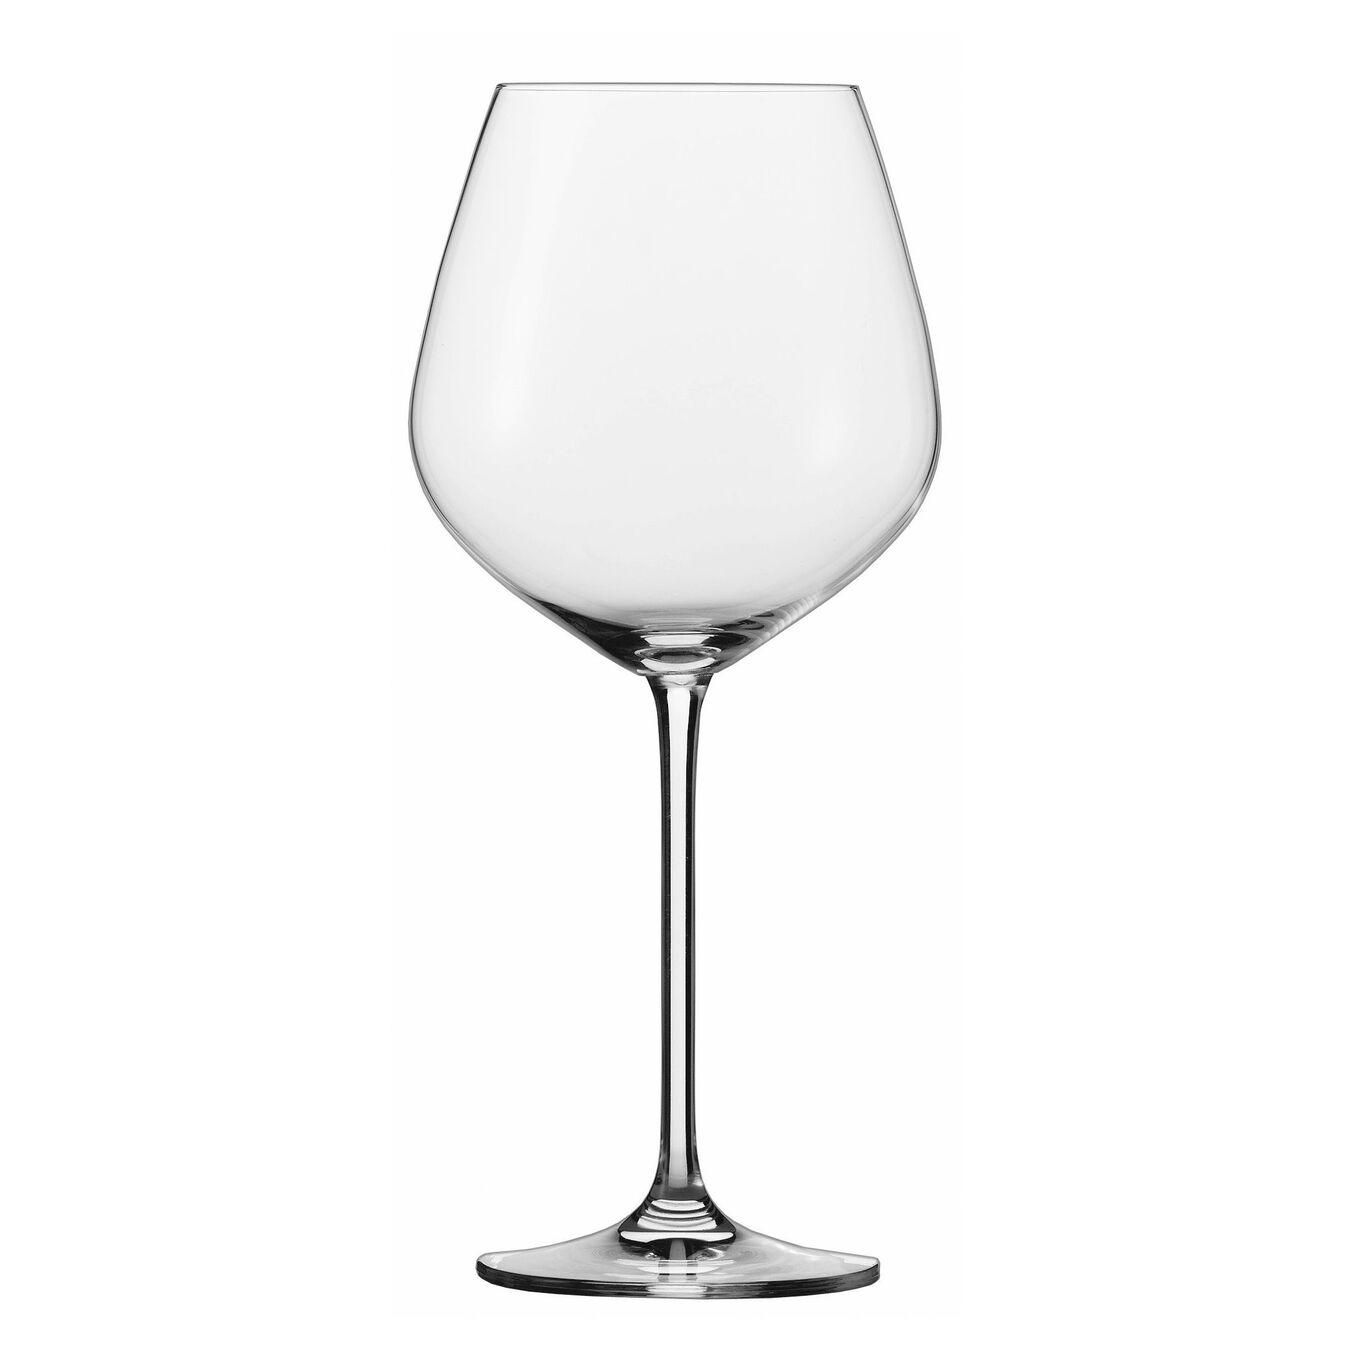 Taça para vinho tinto 740 ml,,large 1